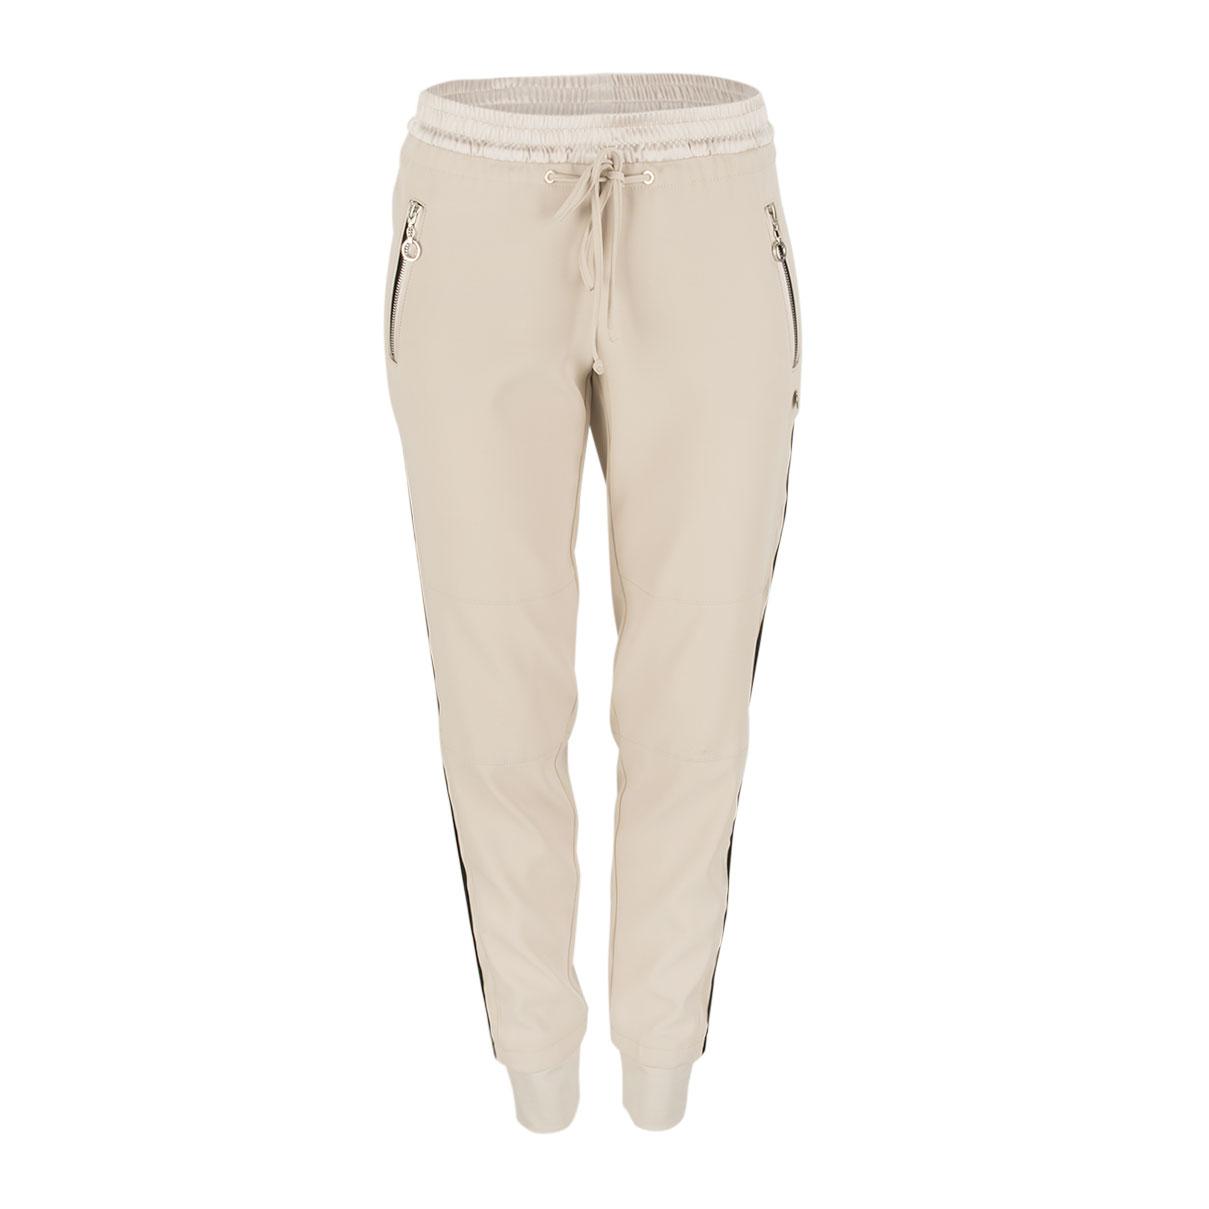 Joggpants -  Account - Tapered Leg